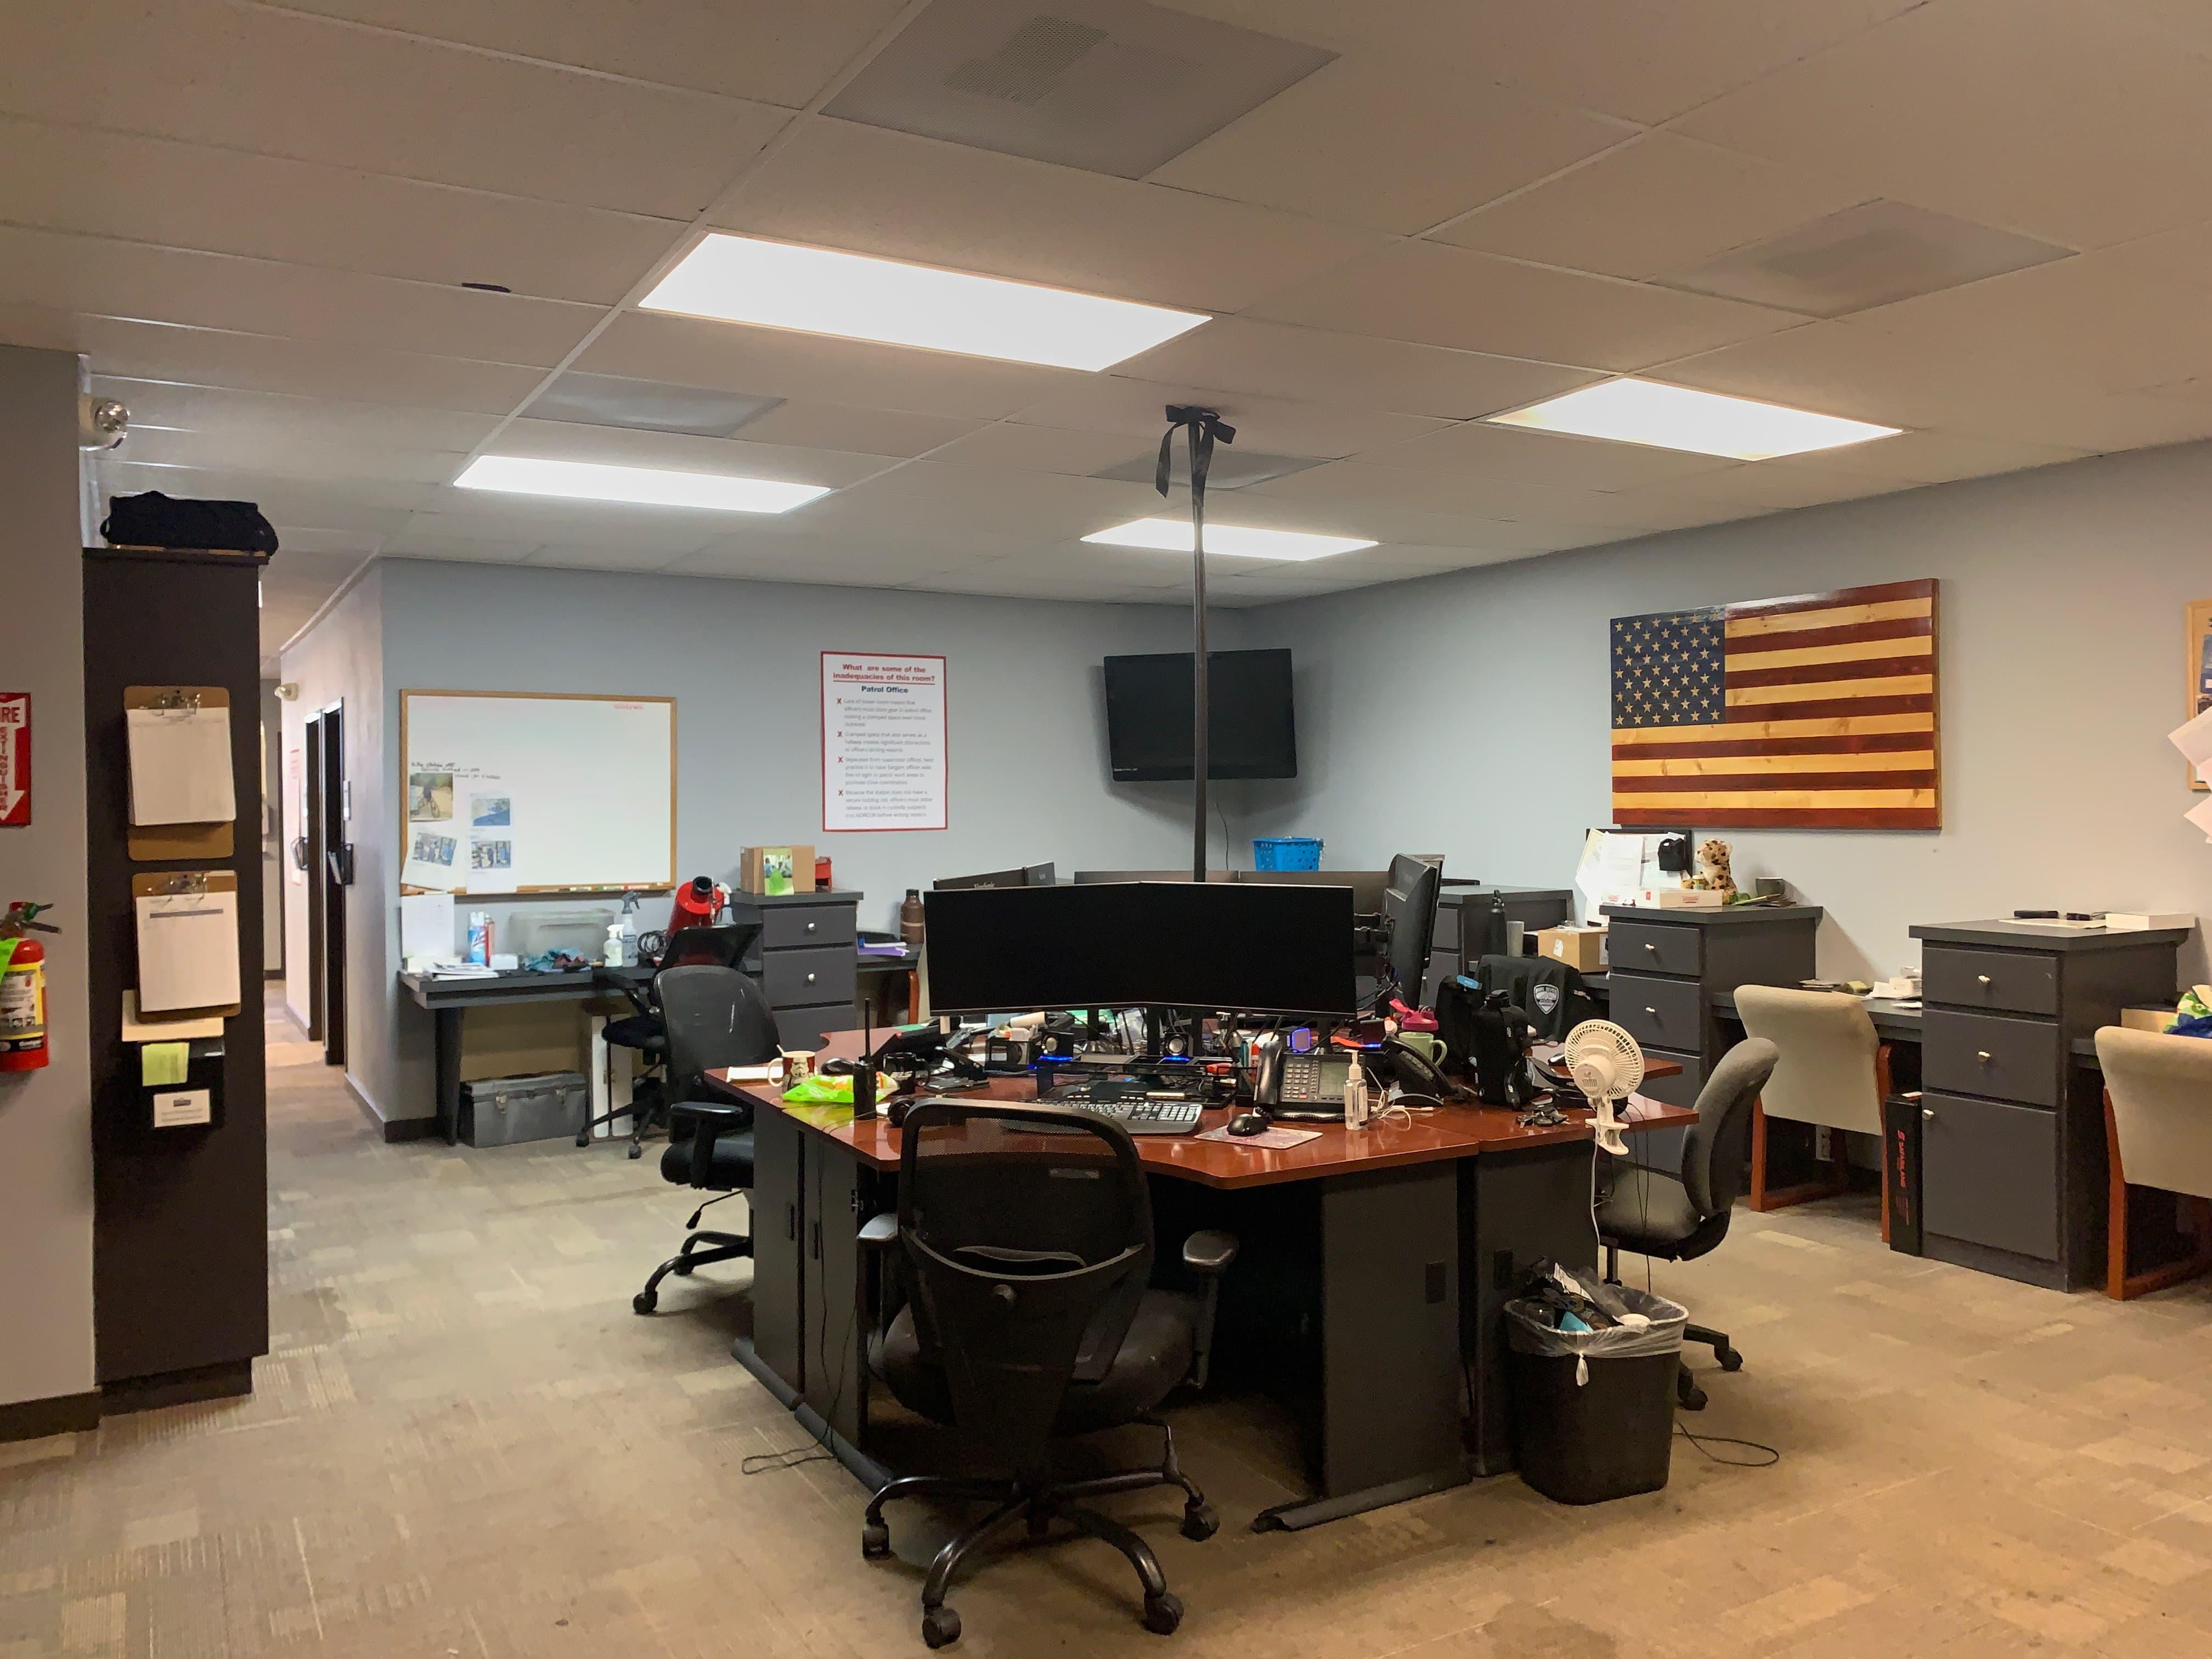 Shared Patrol Officer Workspace